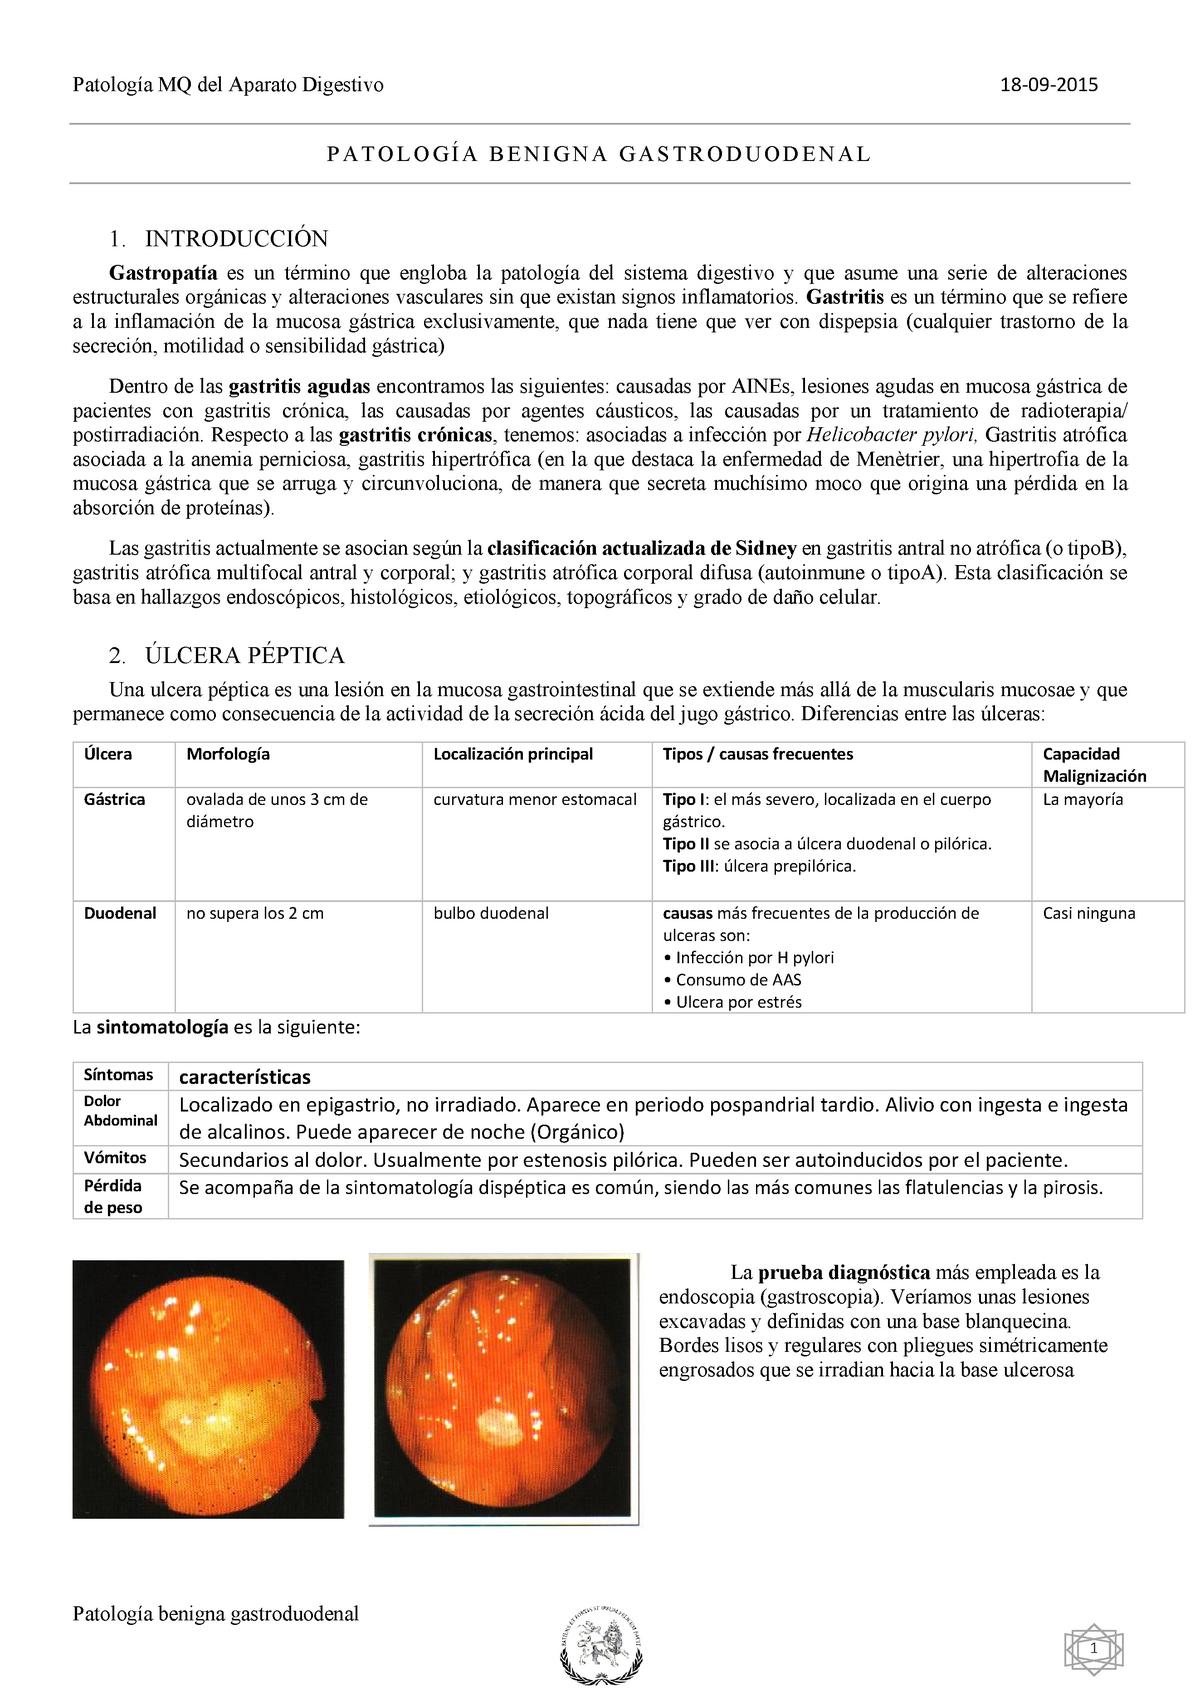 gastritis cronica activa corporal